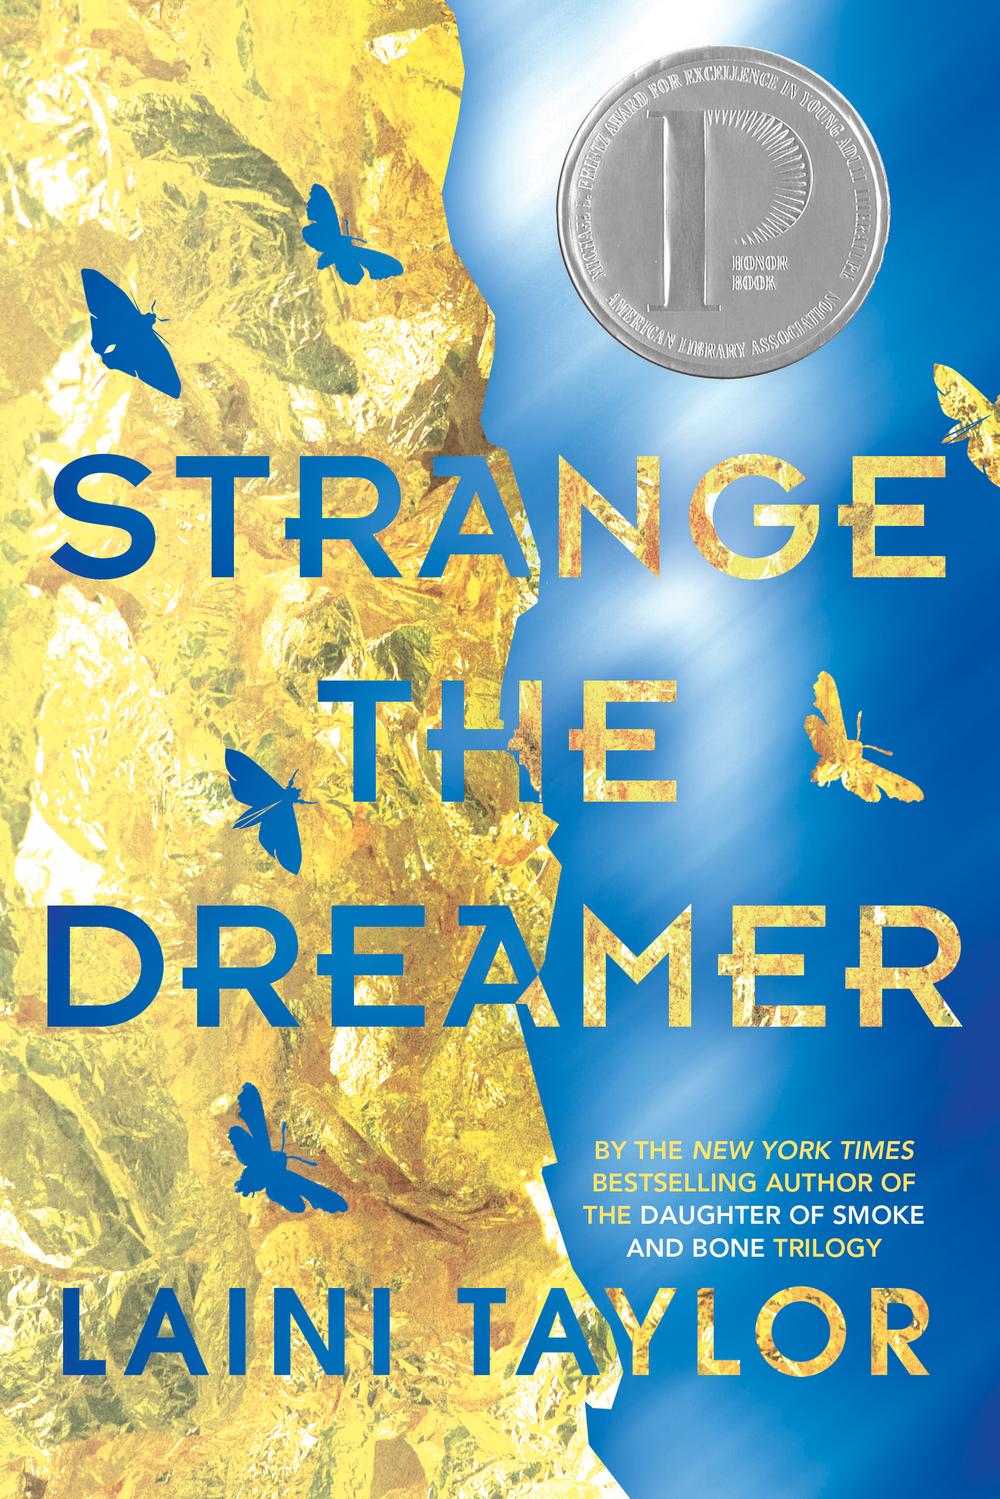 Strange_Dreamer_Printz.png